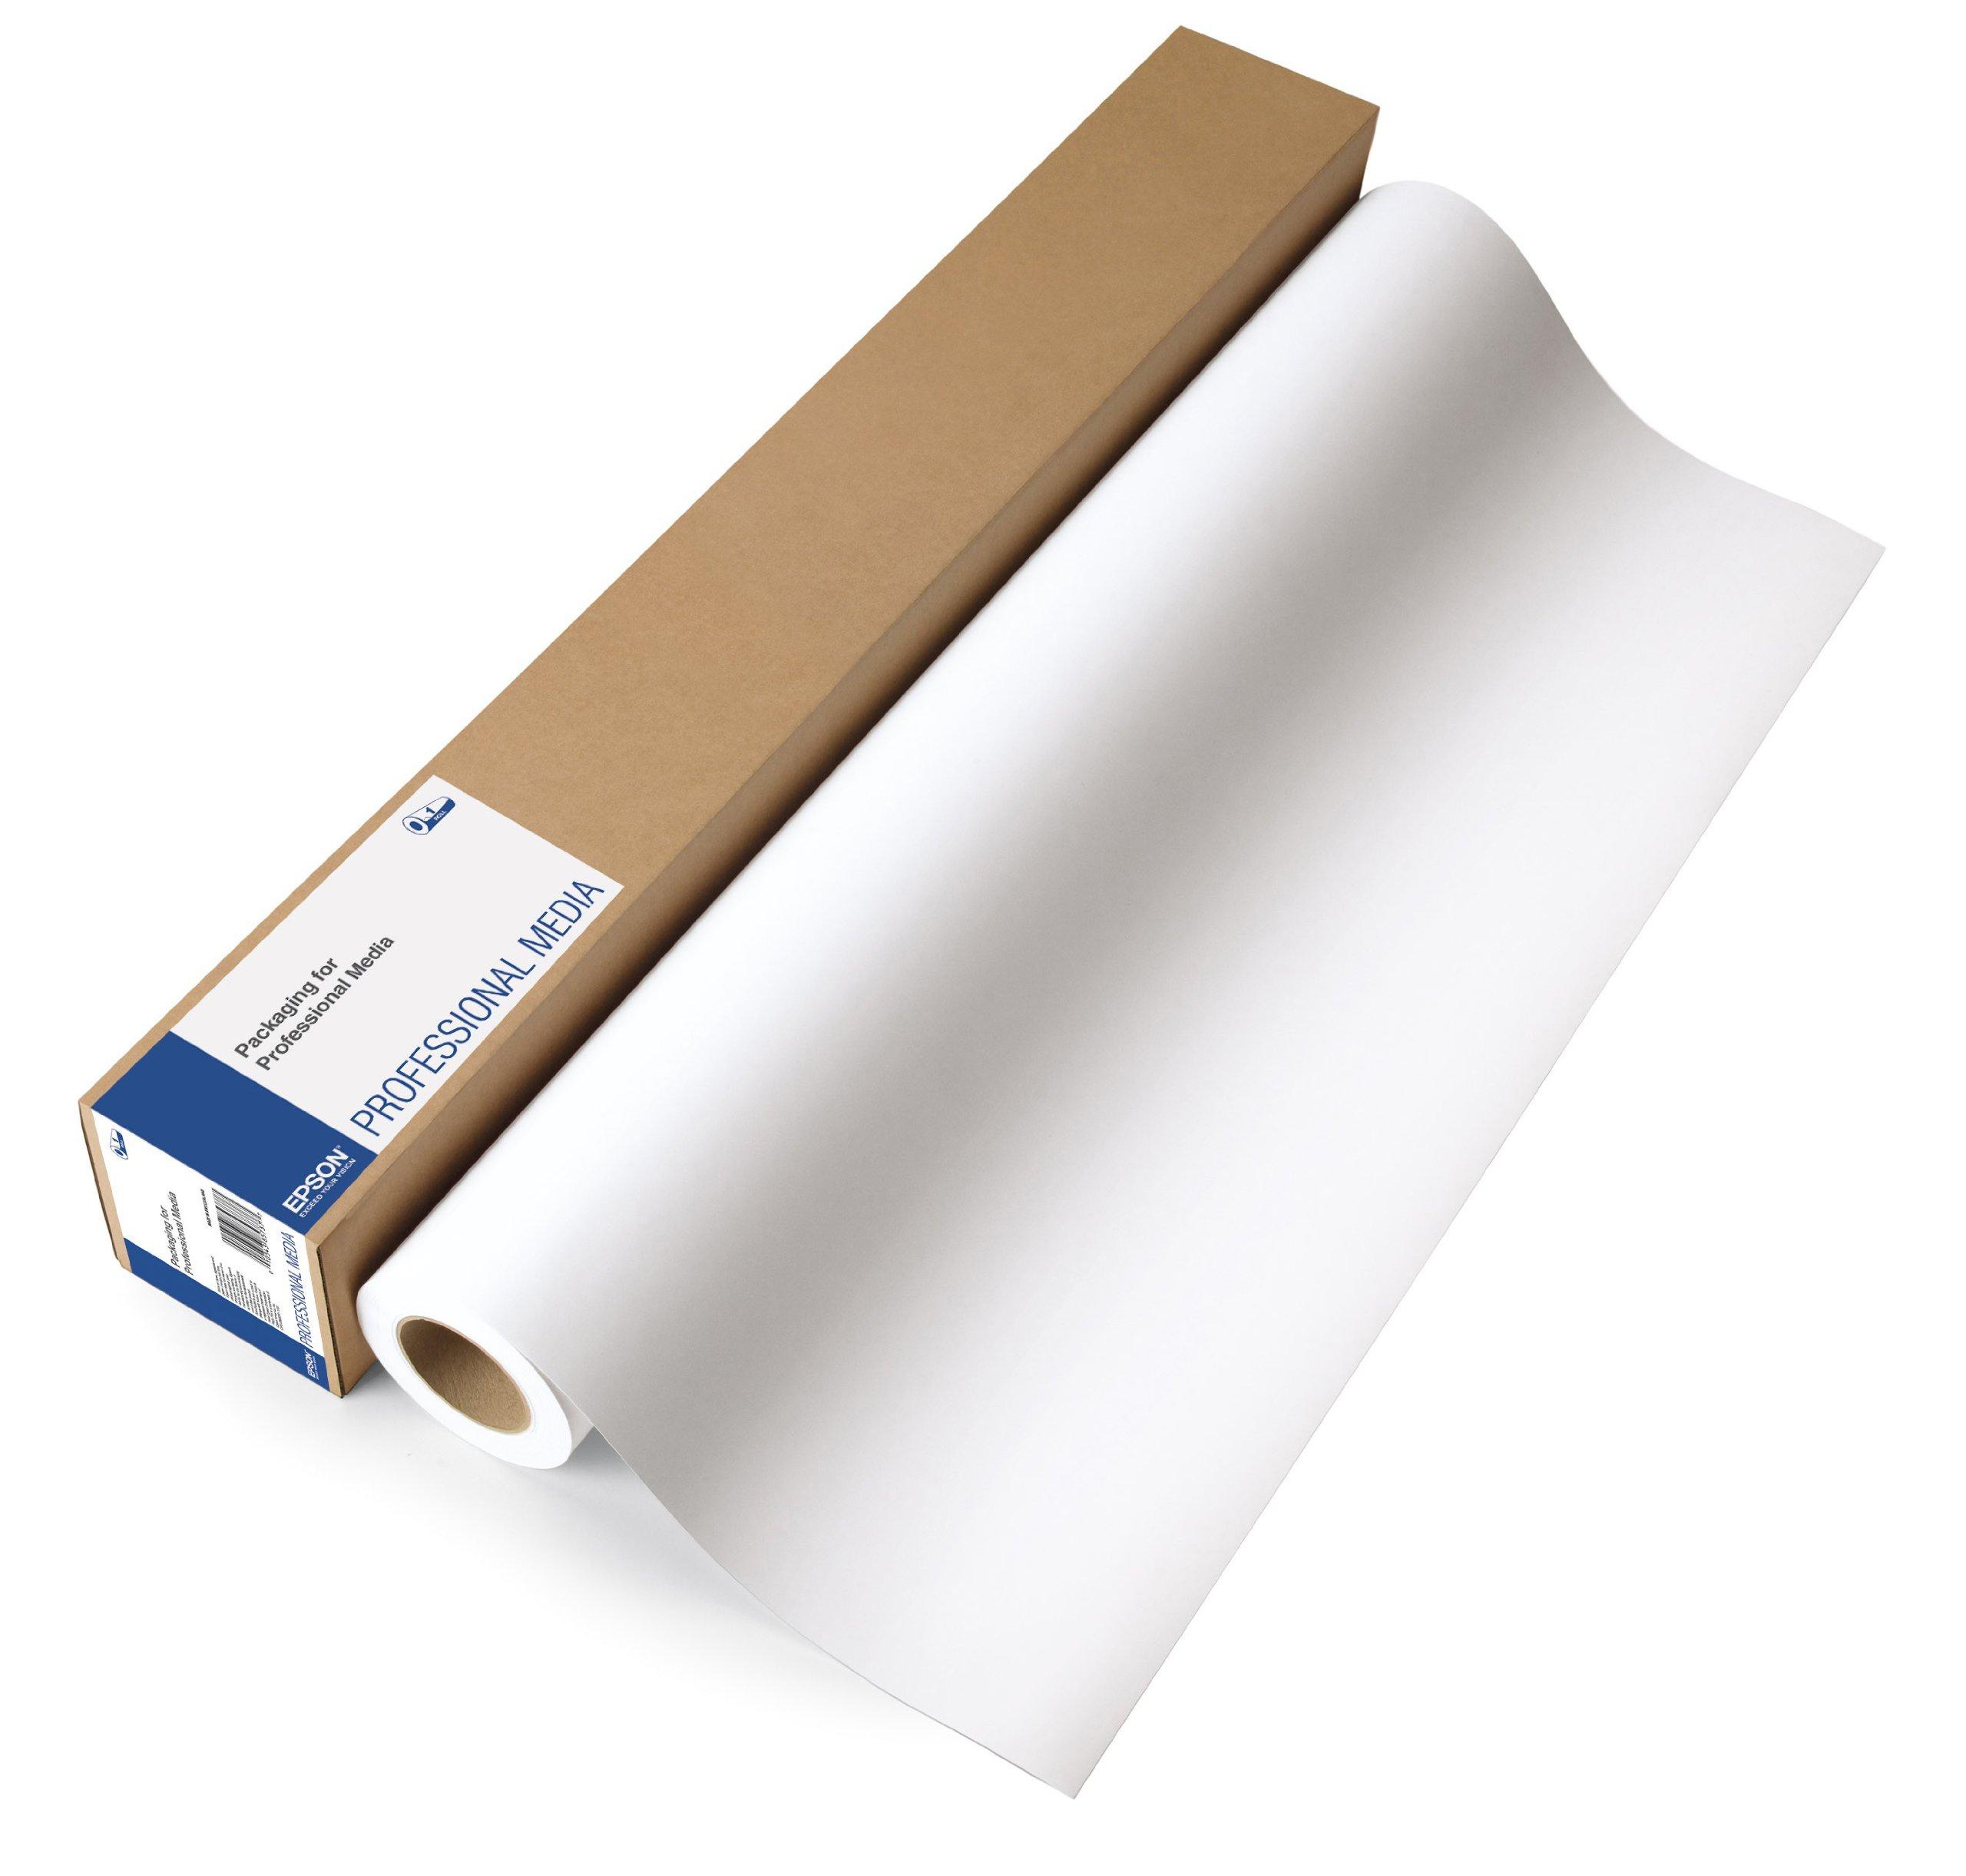 Epson S041619 Enhanced Adhesive Synthetic Inkjet Paper